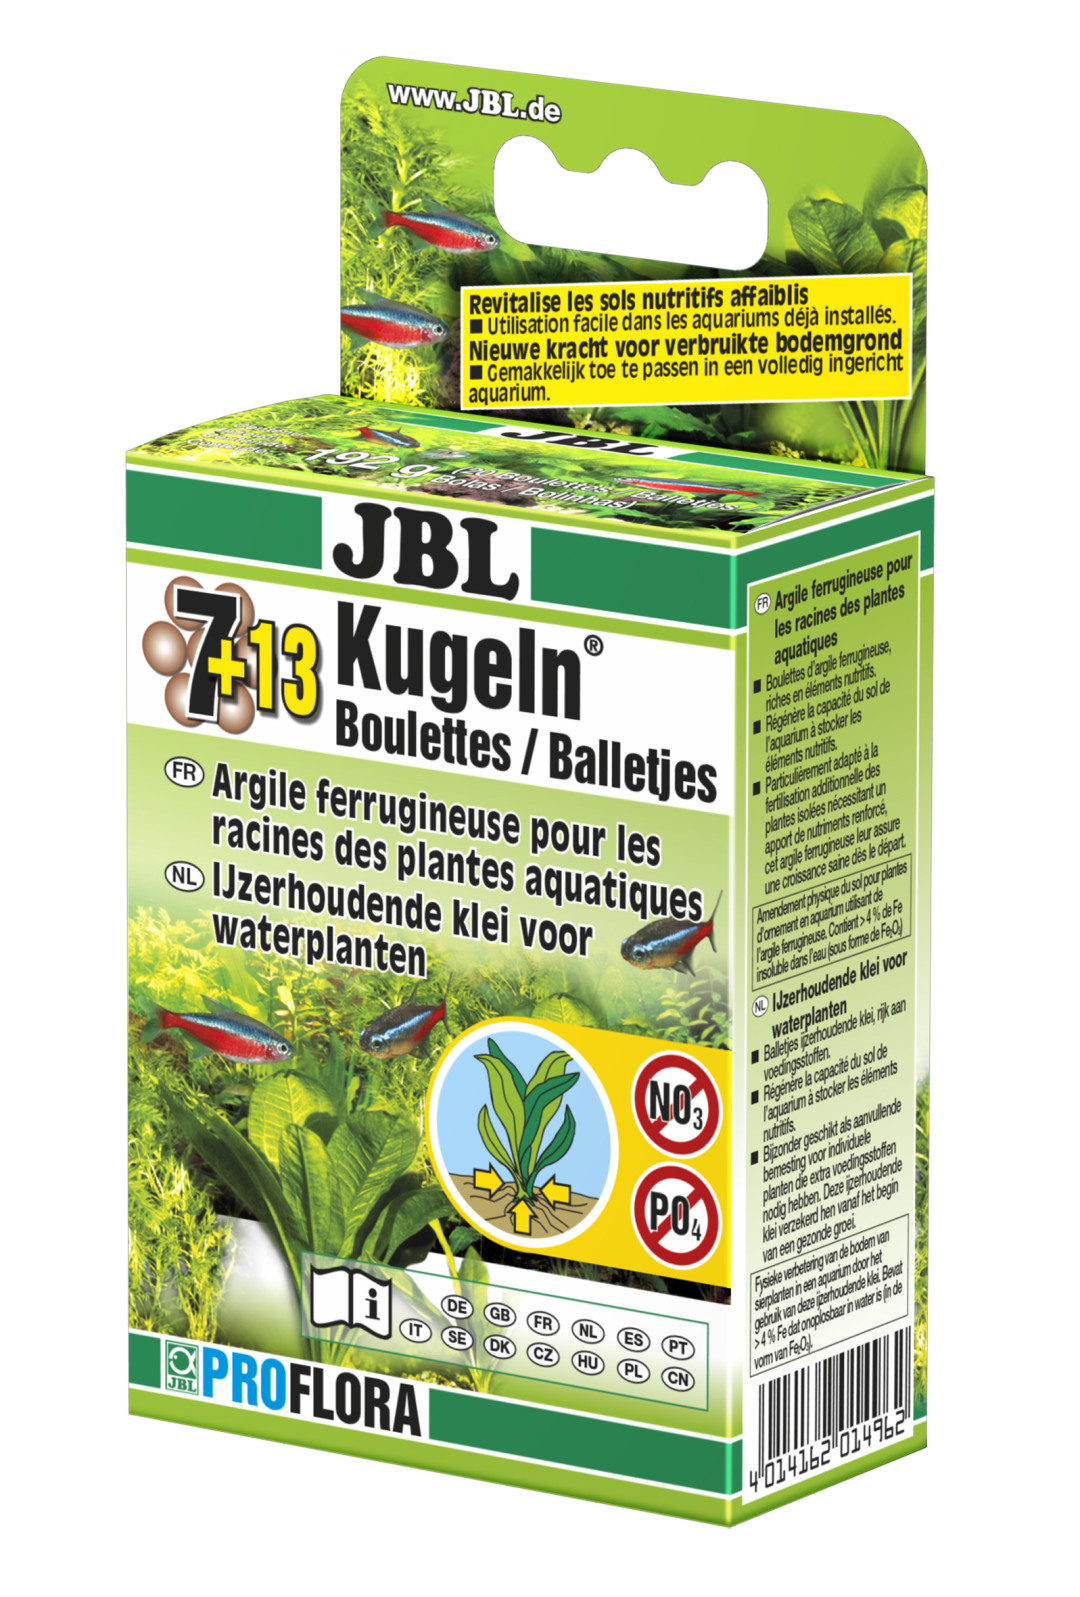 JBL Balletjes 7 + 13 st